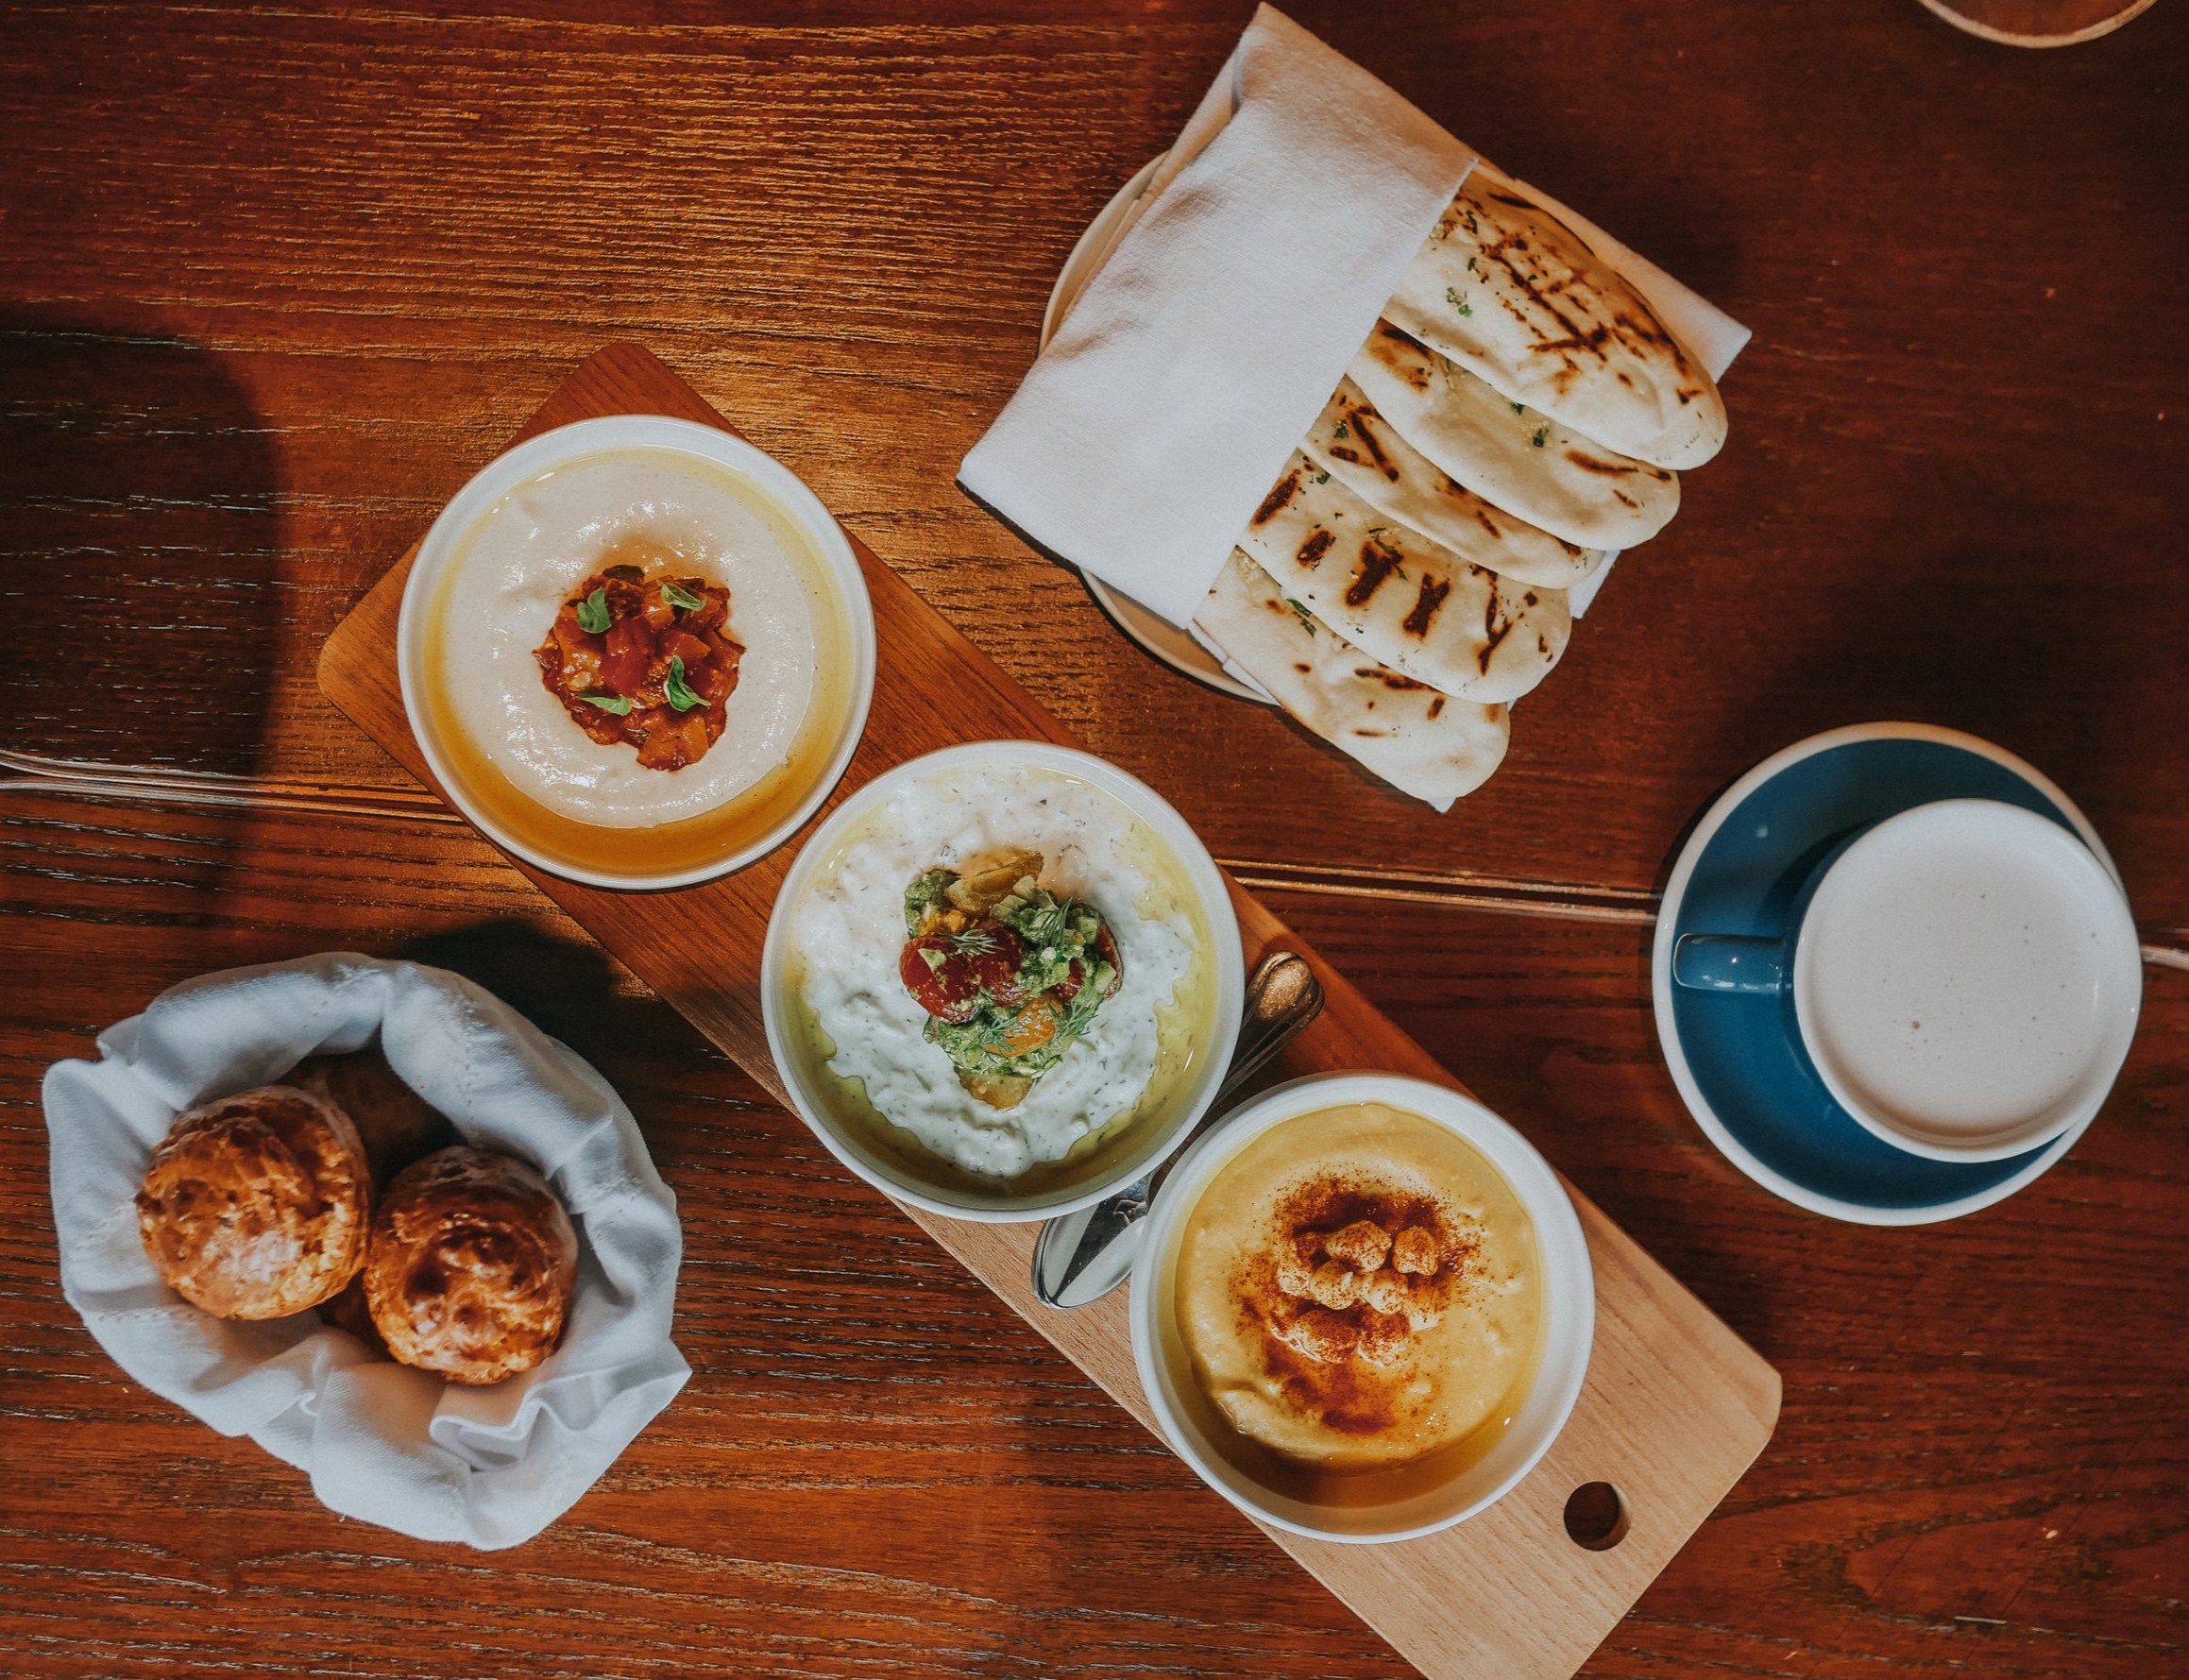 Garlic naan bread with hummus, babaganoush and tzatziki